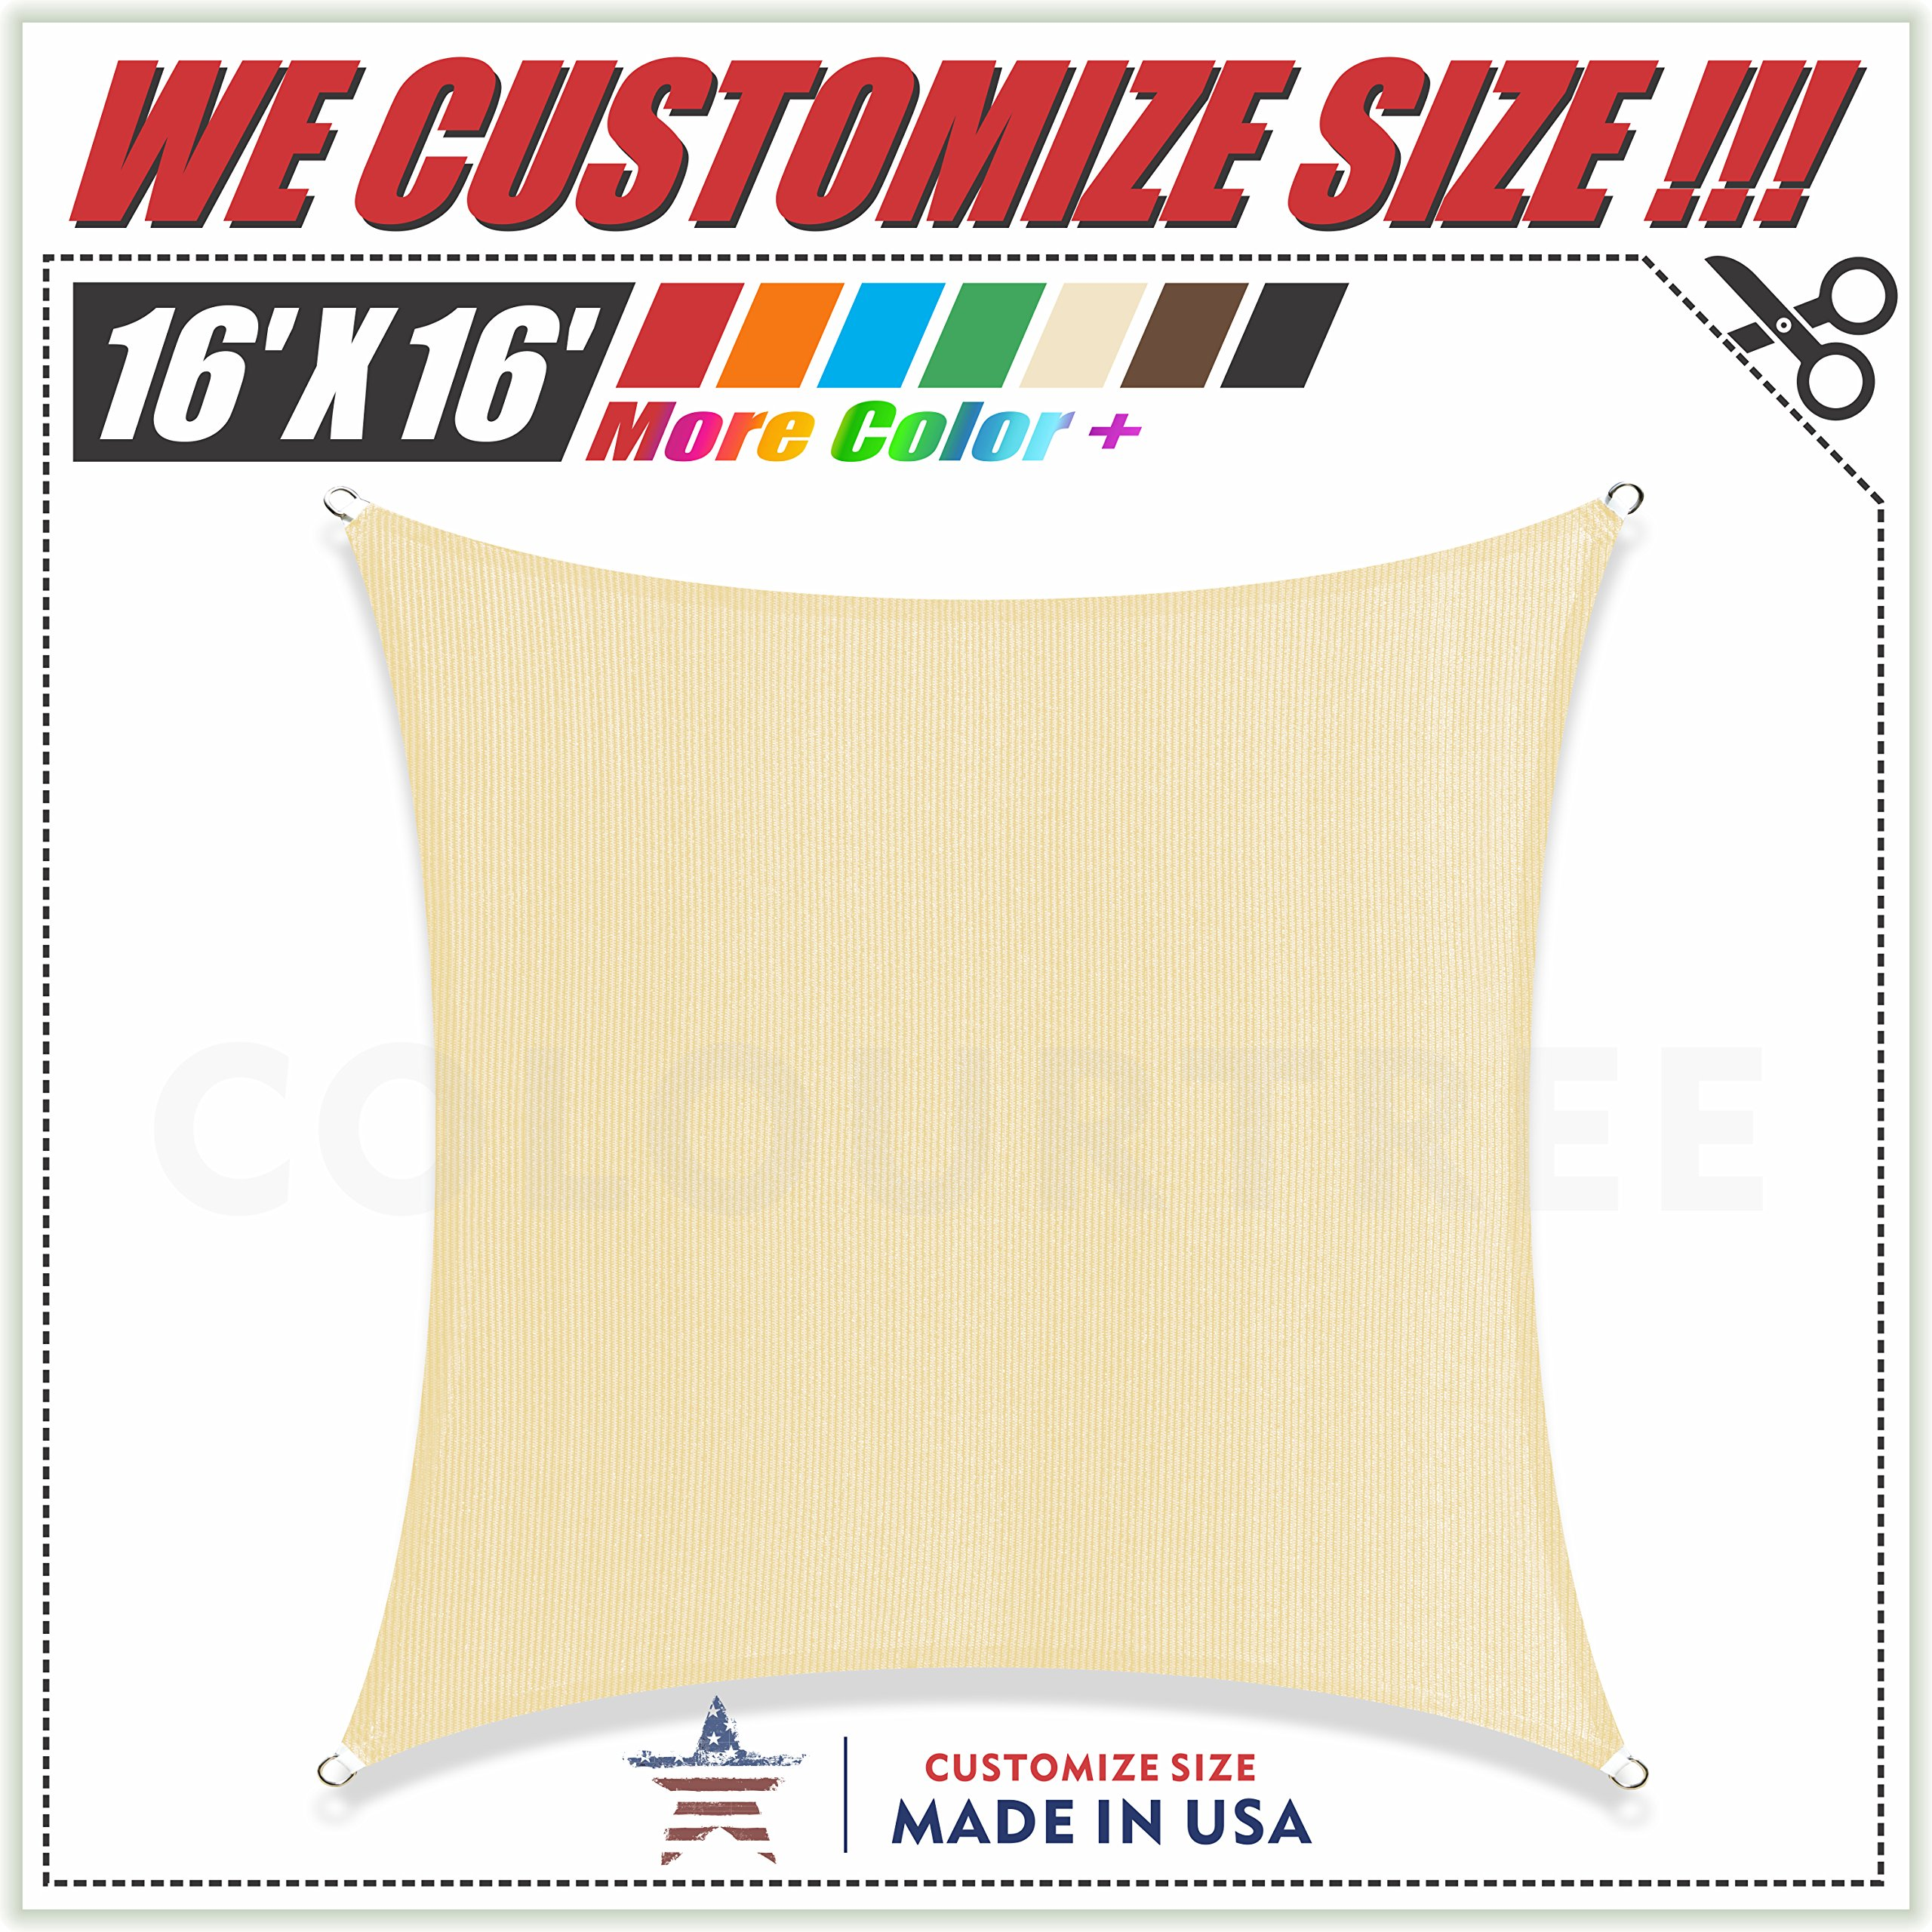 ColourTree 16' x 16' Beige Sun Shade Sail Square Canopy – UV Resistant Heavy Duty Commercial Grade Outdoor Patio Carport (We Make Custom Size)